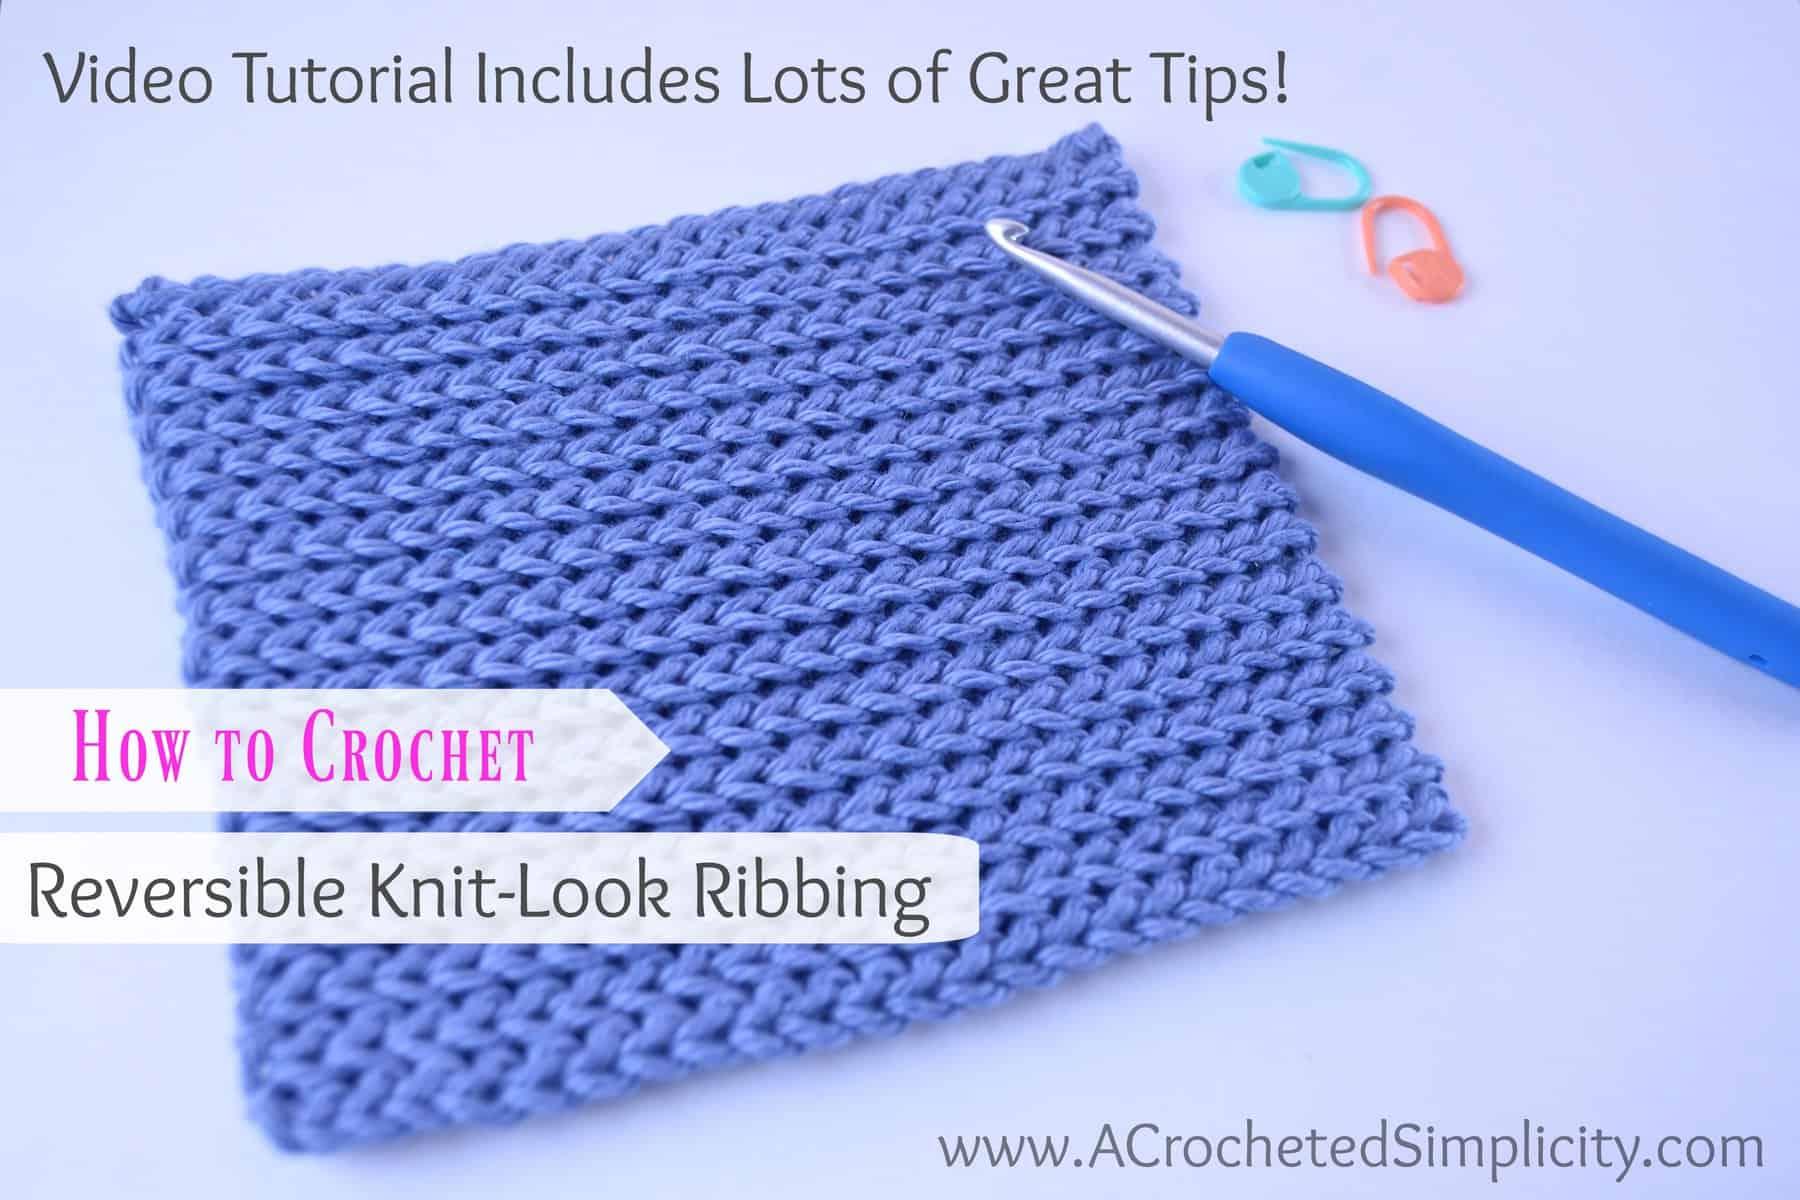 Knitting Ribbing Tips : How to crochet reversible knit look ribbing video